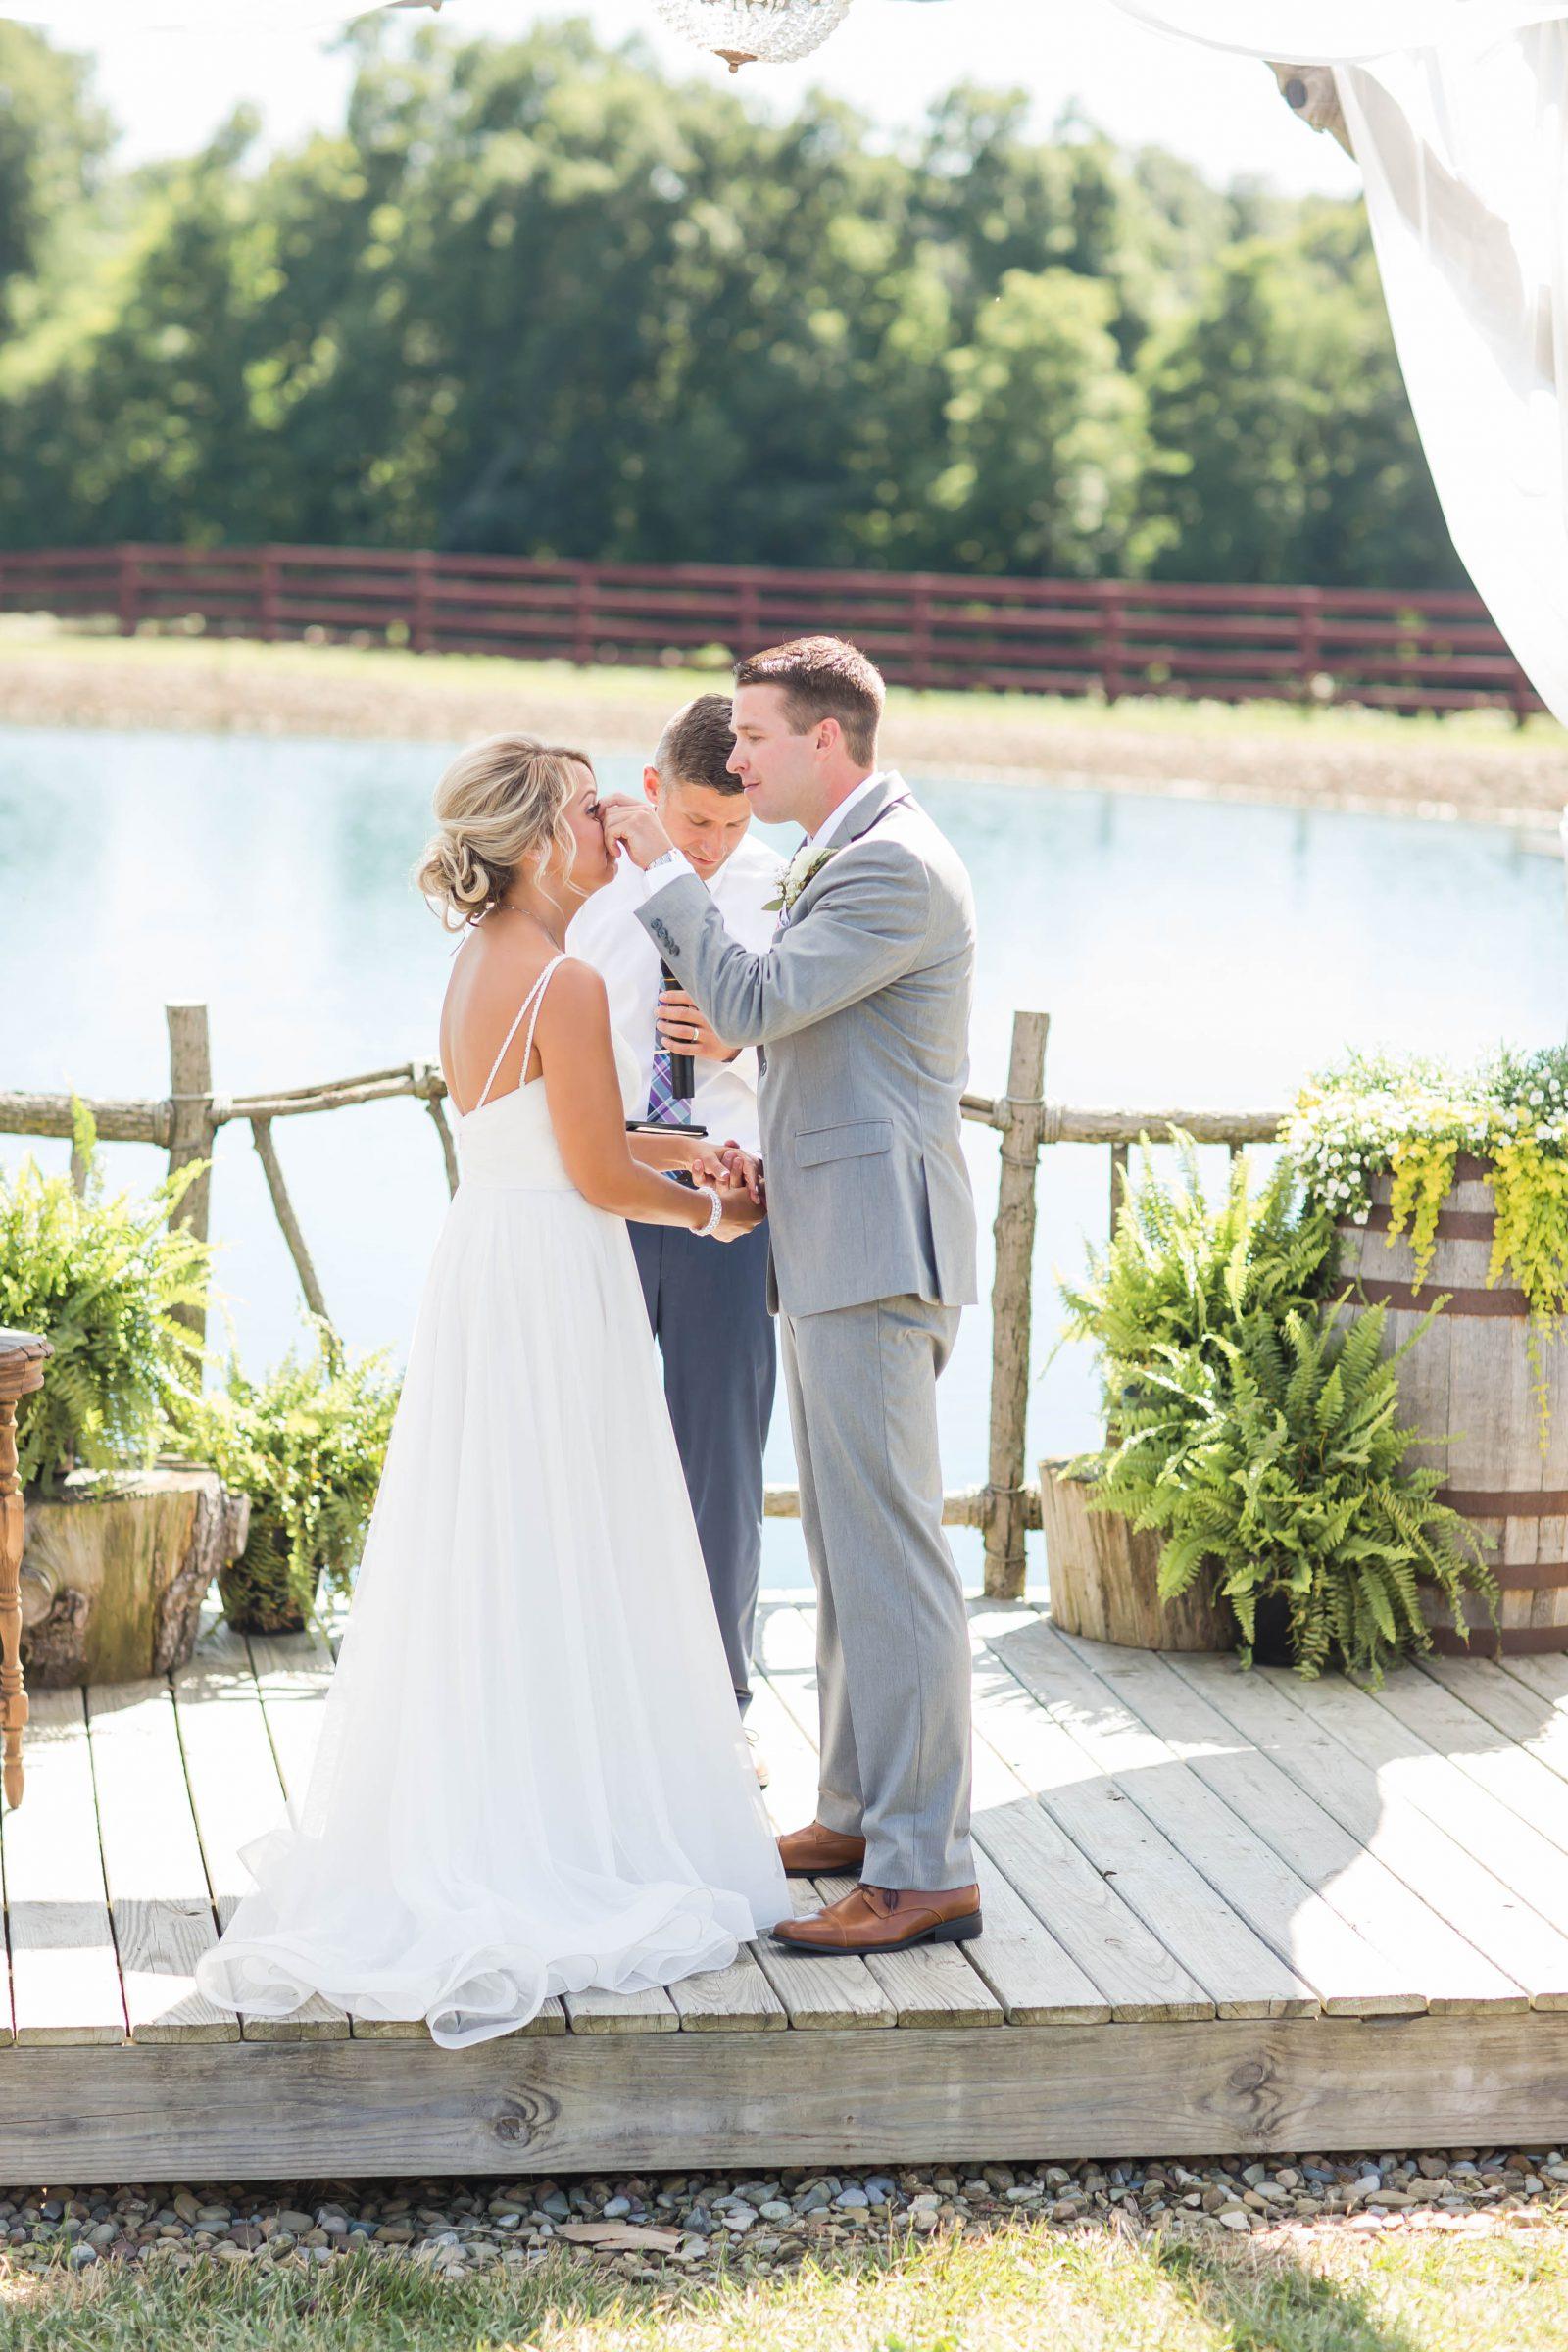 peacock-ridge-summer-wedding-photographer-akron-ohio-loren-jackson-photography-72